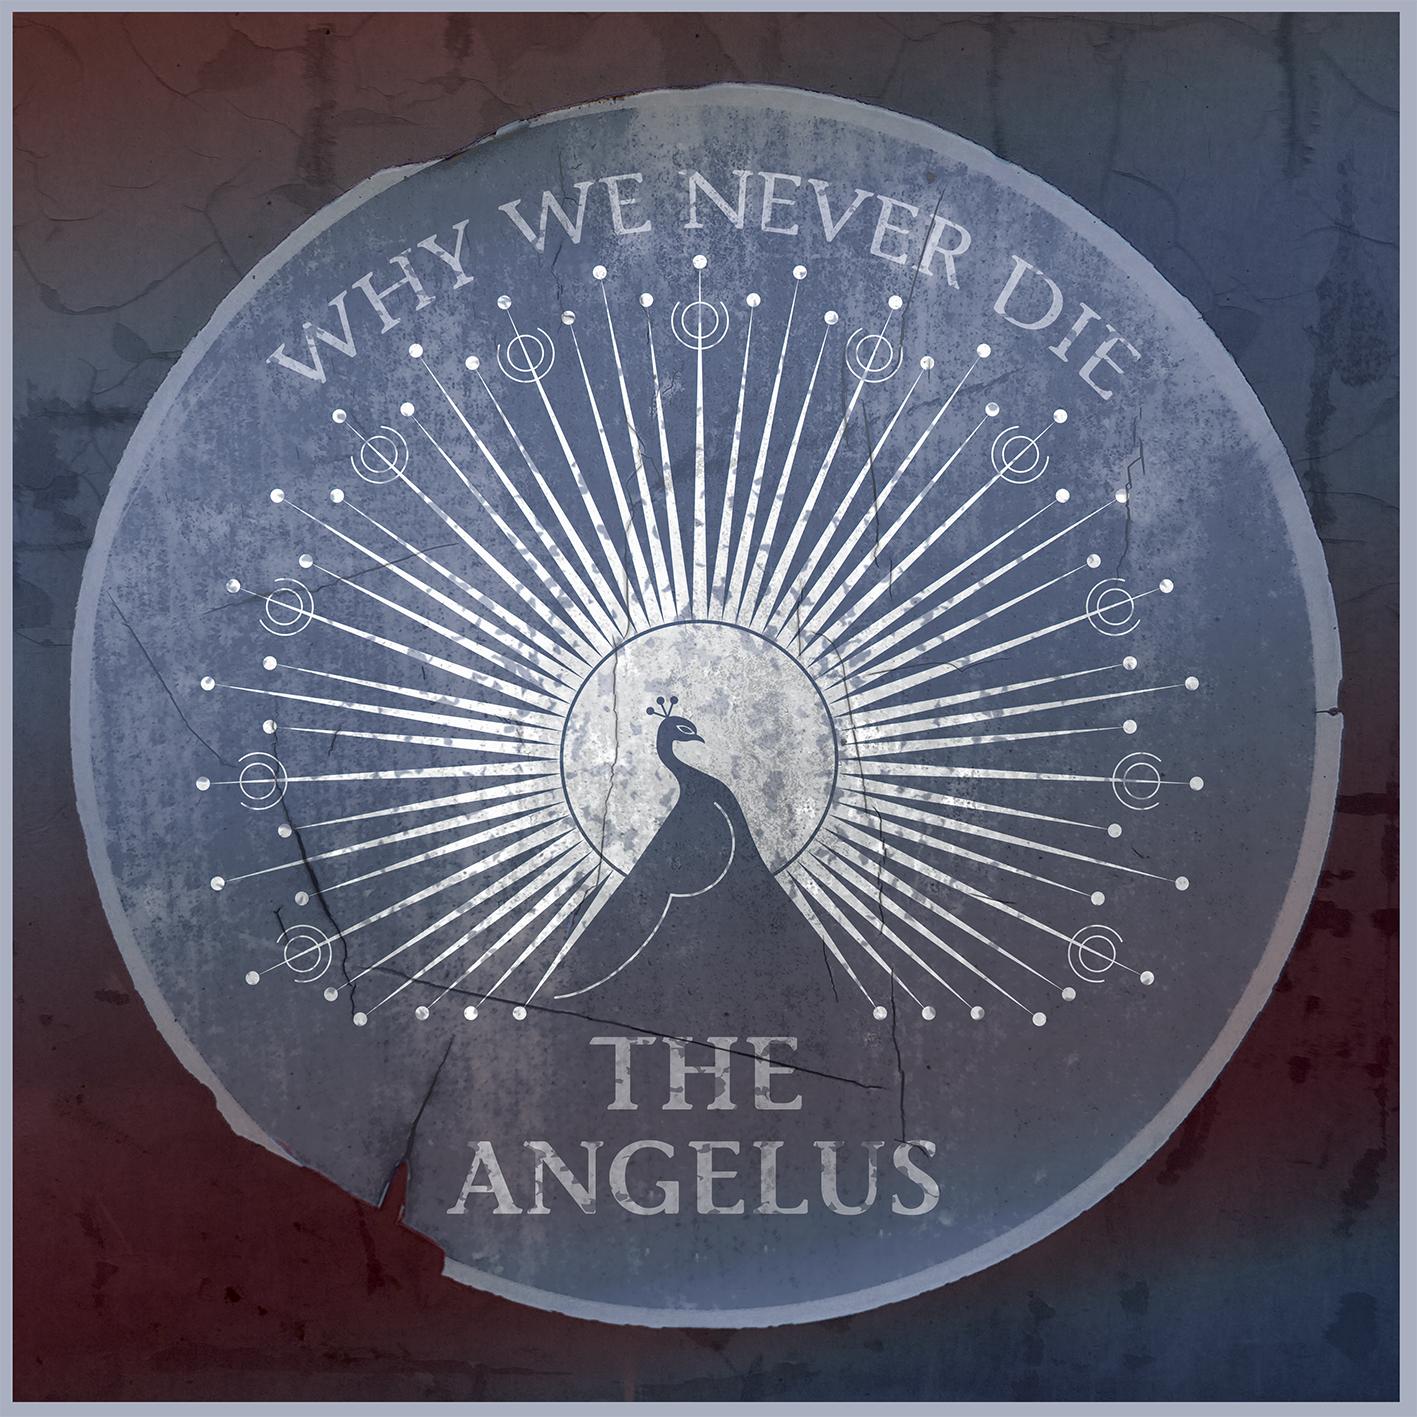 The Angelus Why We Never Die